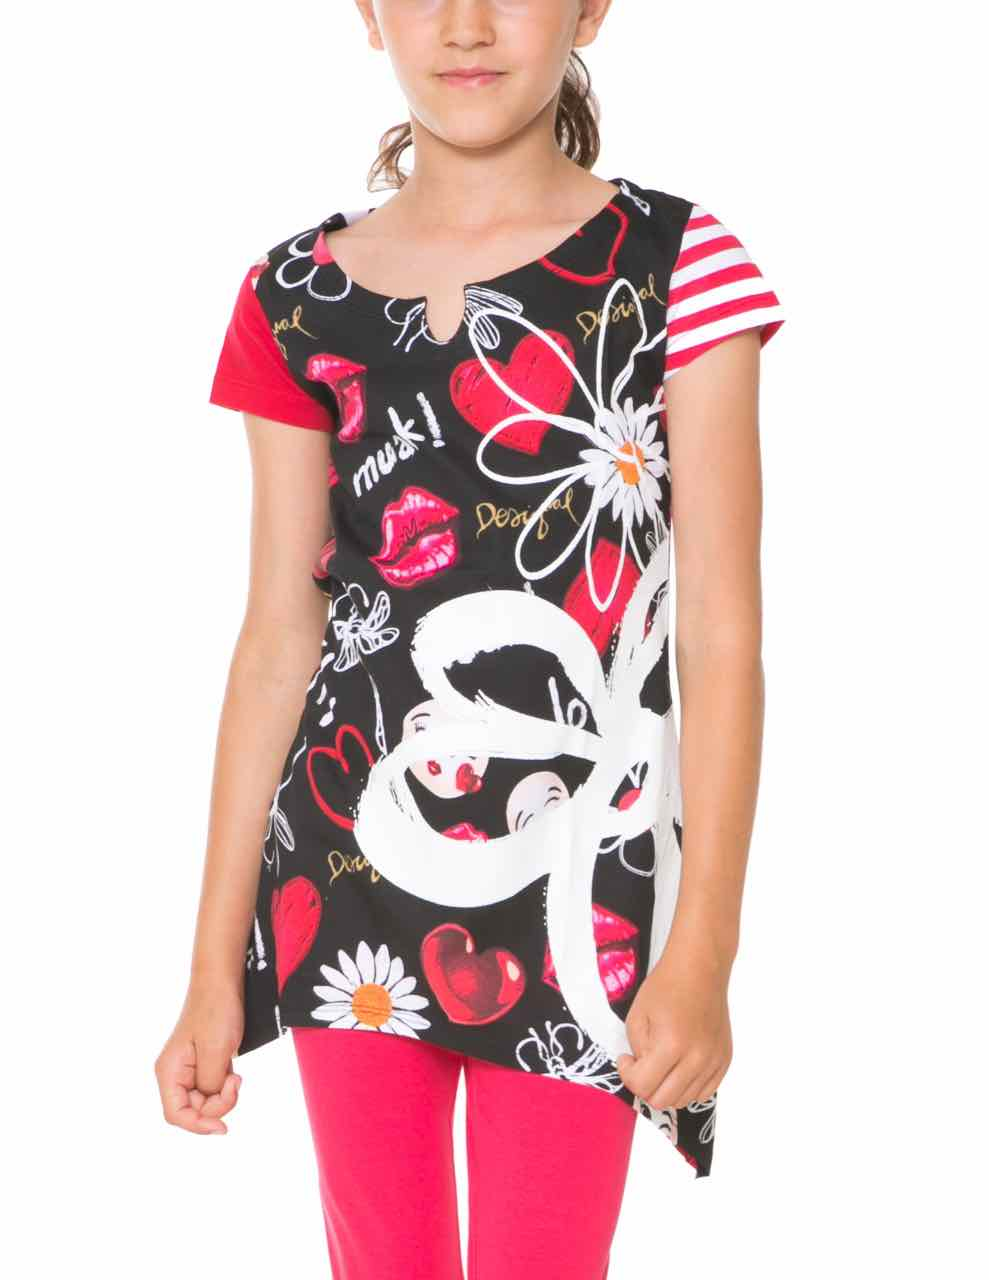 61T30L2_2000 Desigual Girl T-Shirt Swan